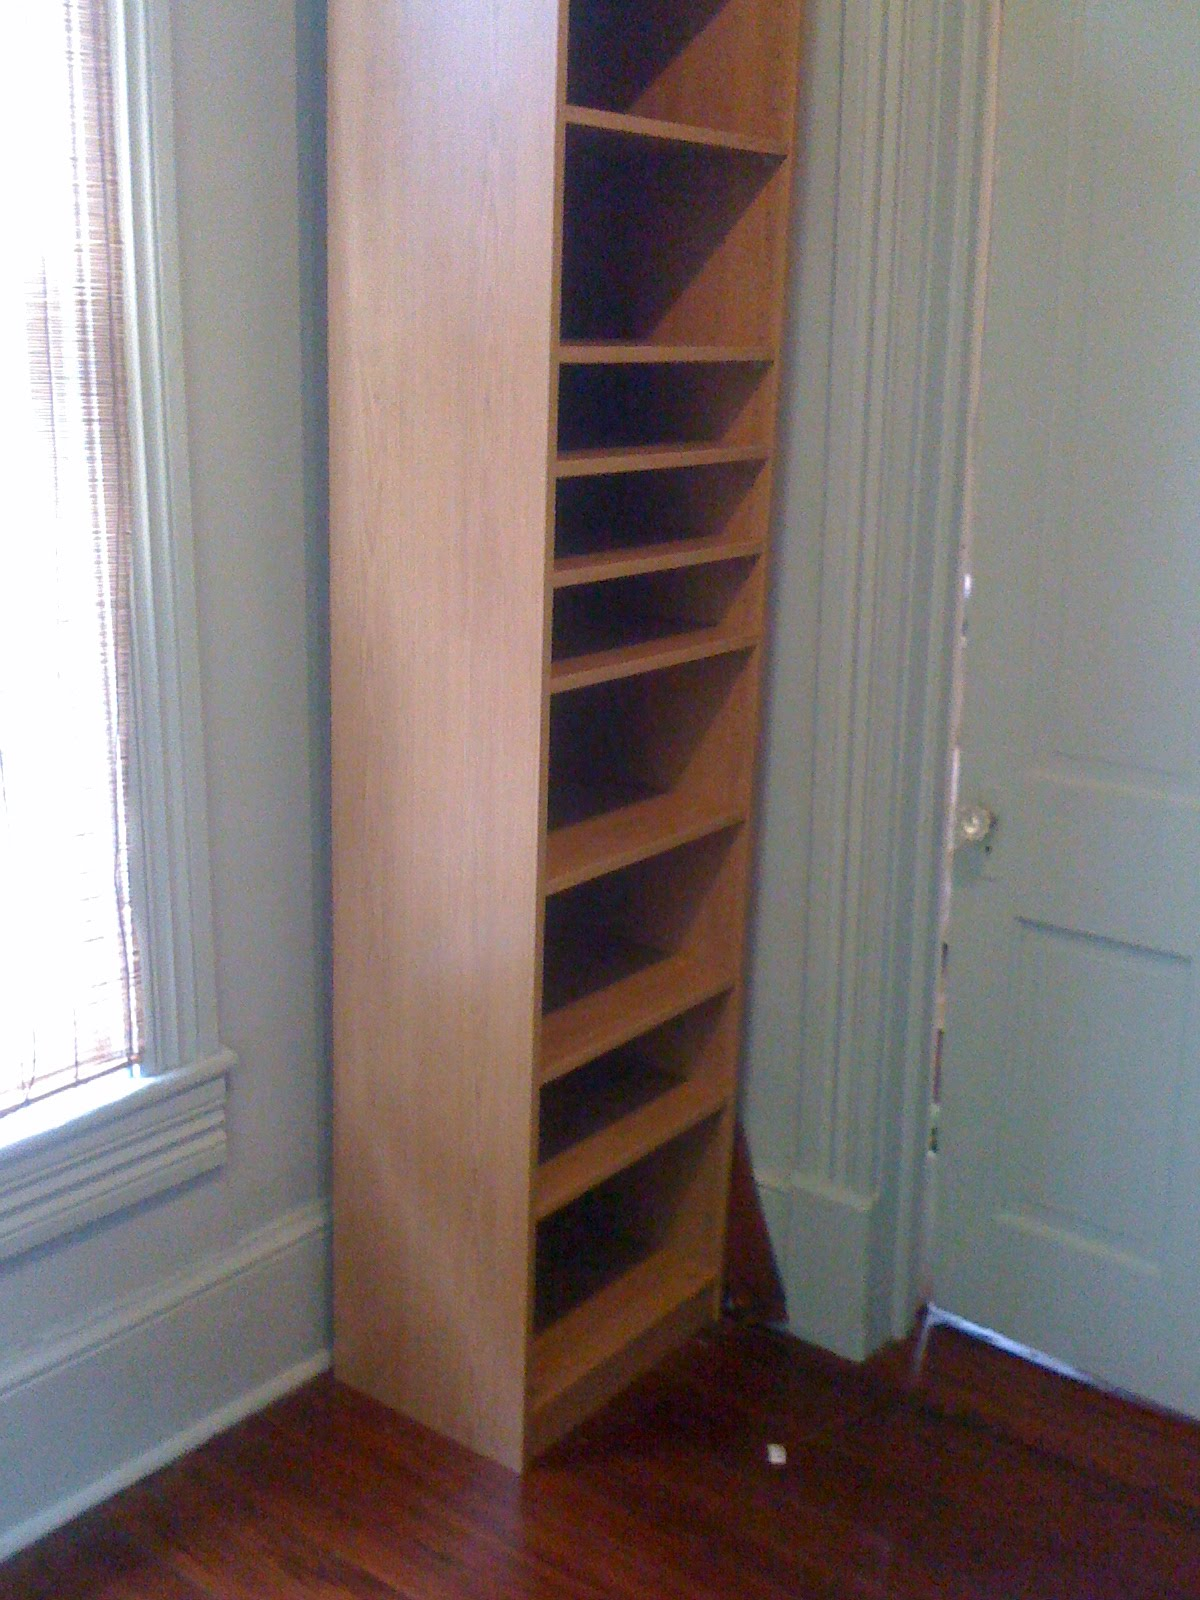 so long savannah on hold ikea pax shelves 75. Black Bedroom Furniture Sets. Home Design Ideas